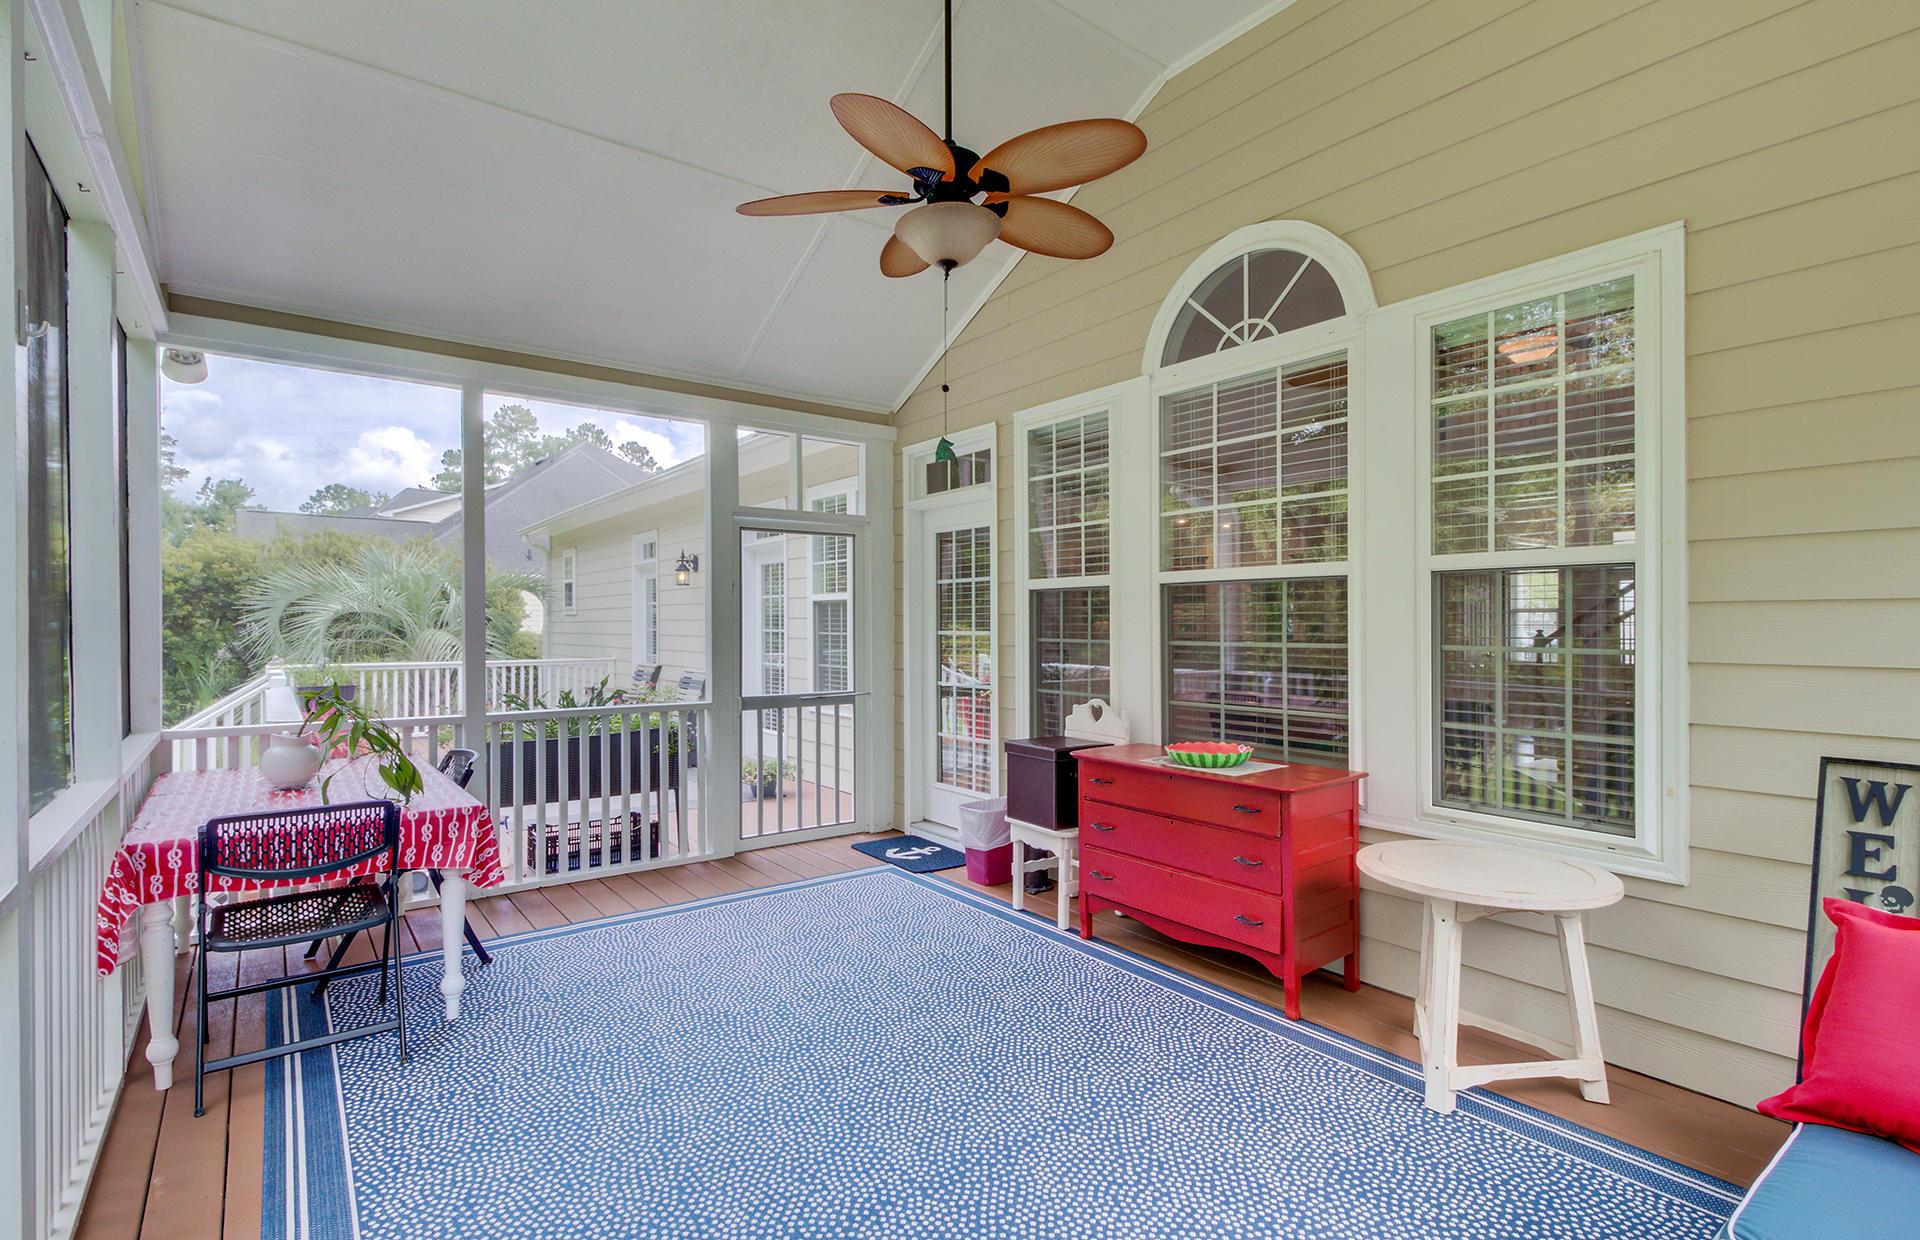 Dunes West Homes For Sale - 2453 Darts Cove, Mount Pleasant, SC - 18